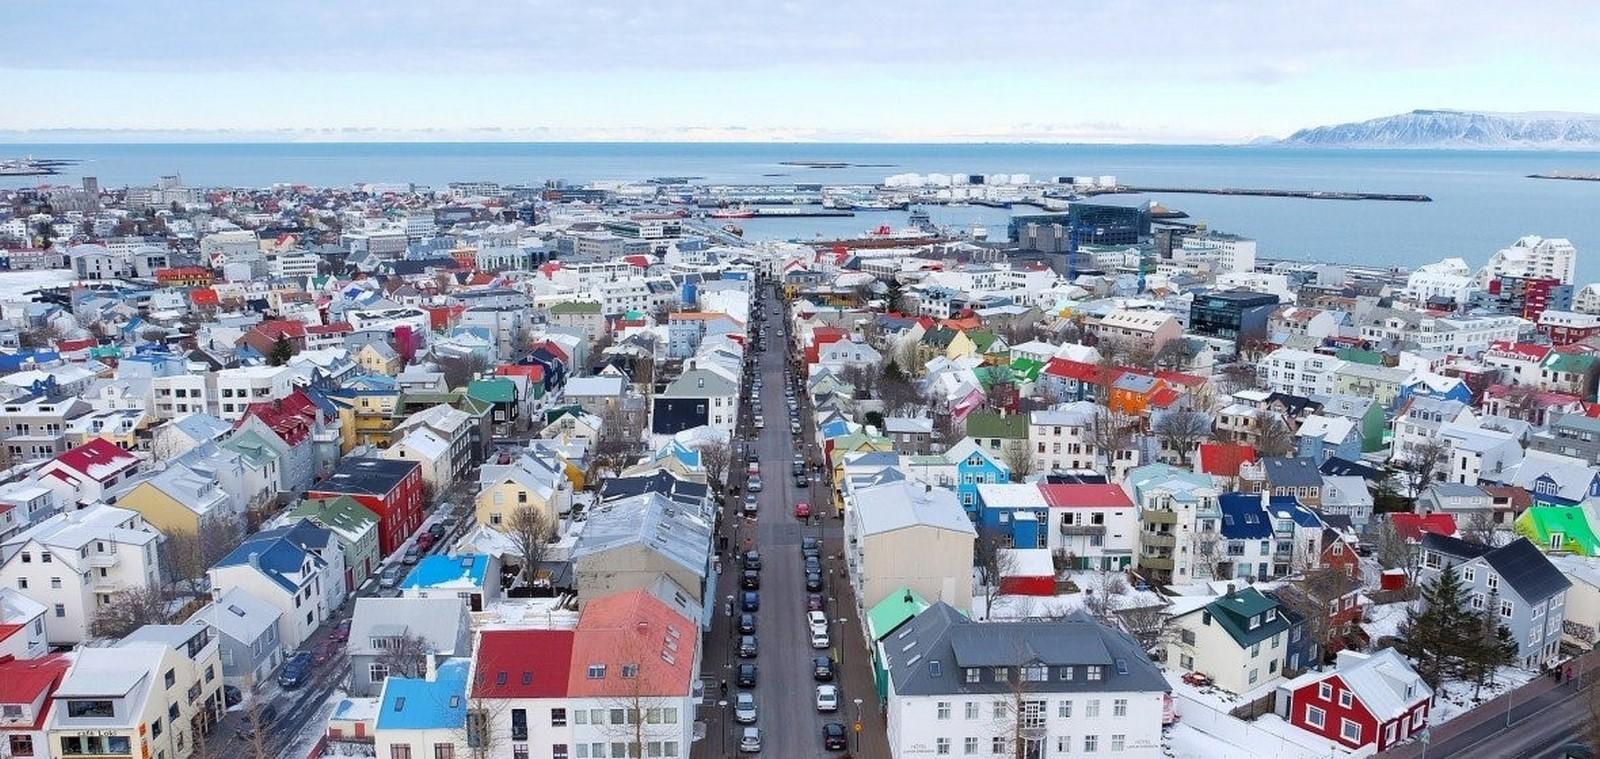 Hallgrimskirkja by Guðjón Samúelsson: The largest church in Iceland - Sheet8